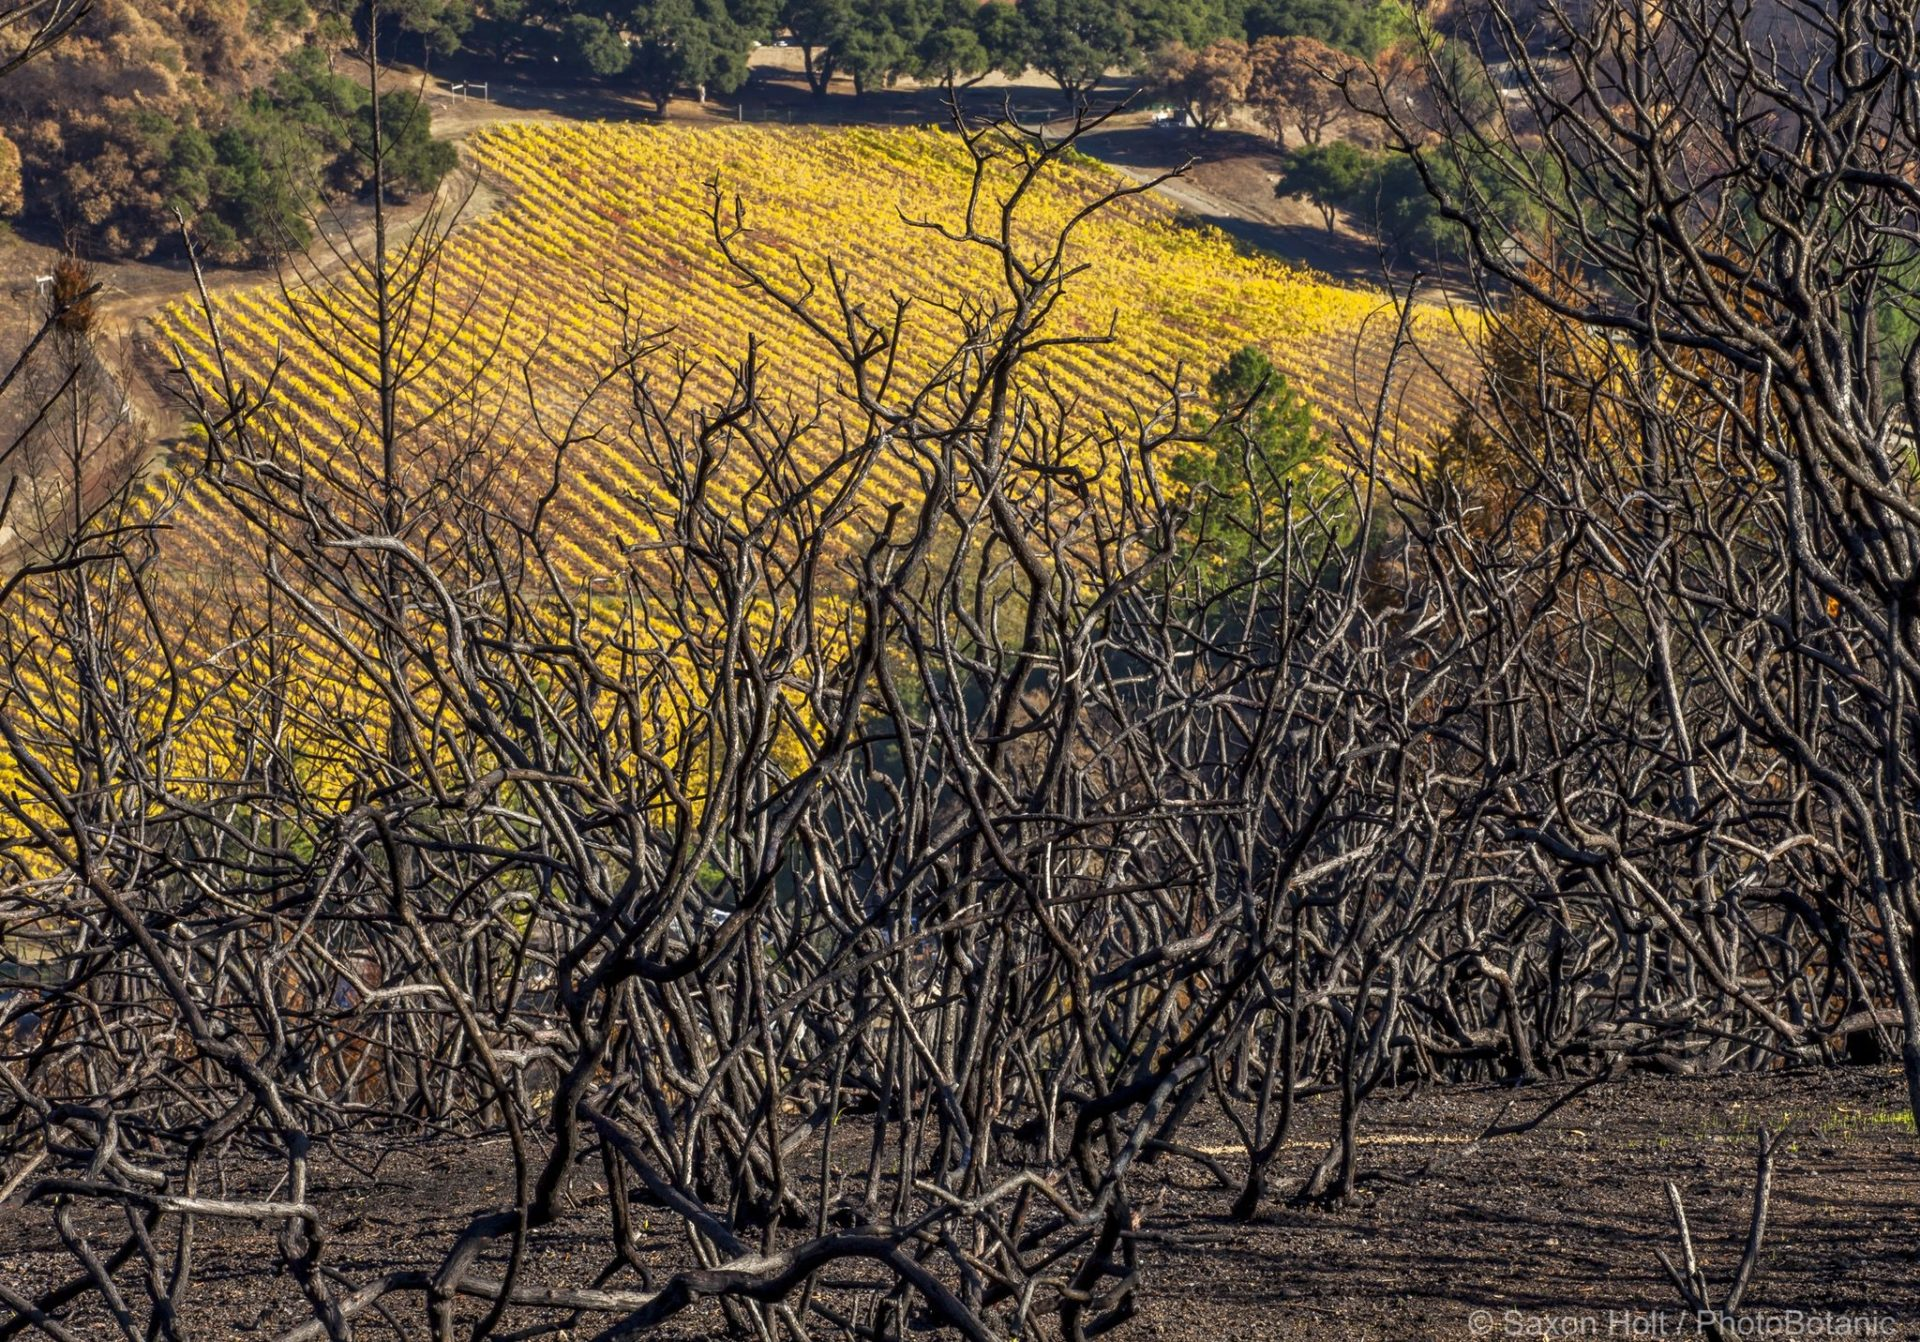 California native landscape, burned manzanita with vineyard in distance; 2017 Sonoma Tubbs fire, Pepperwood Preserve